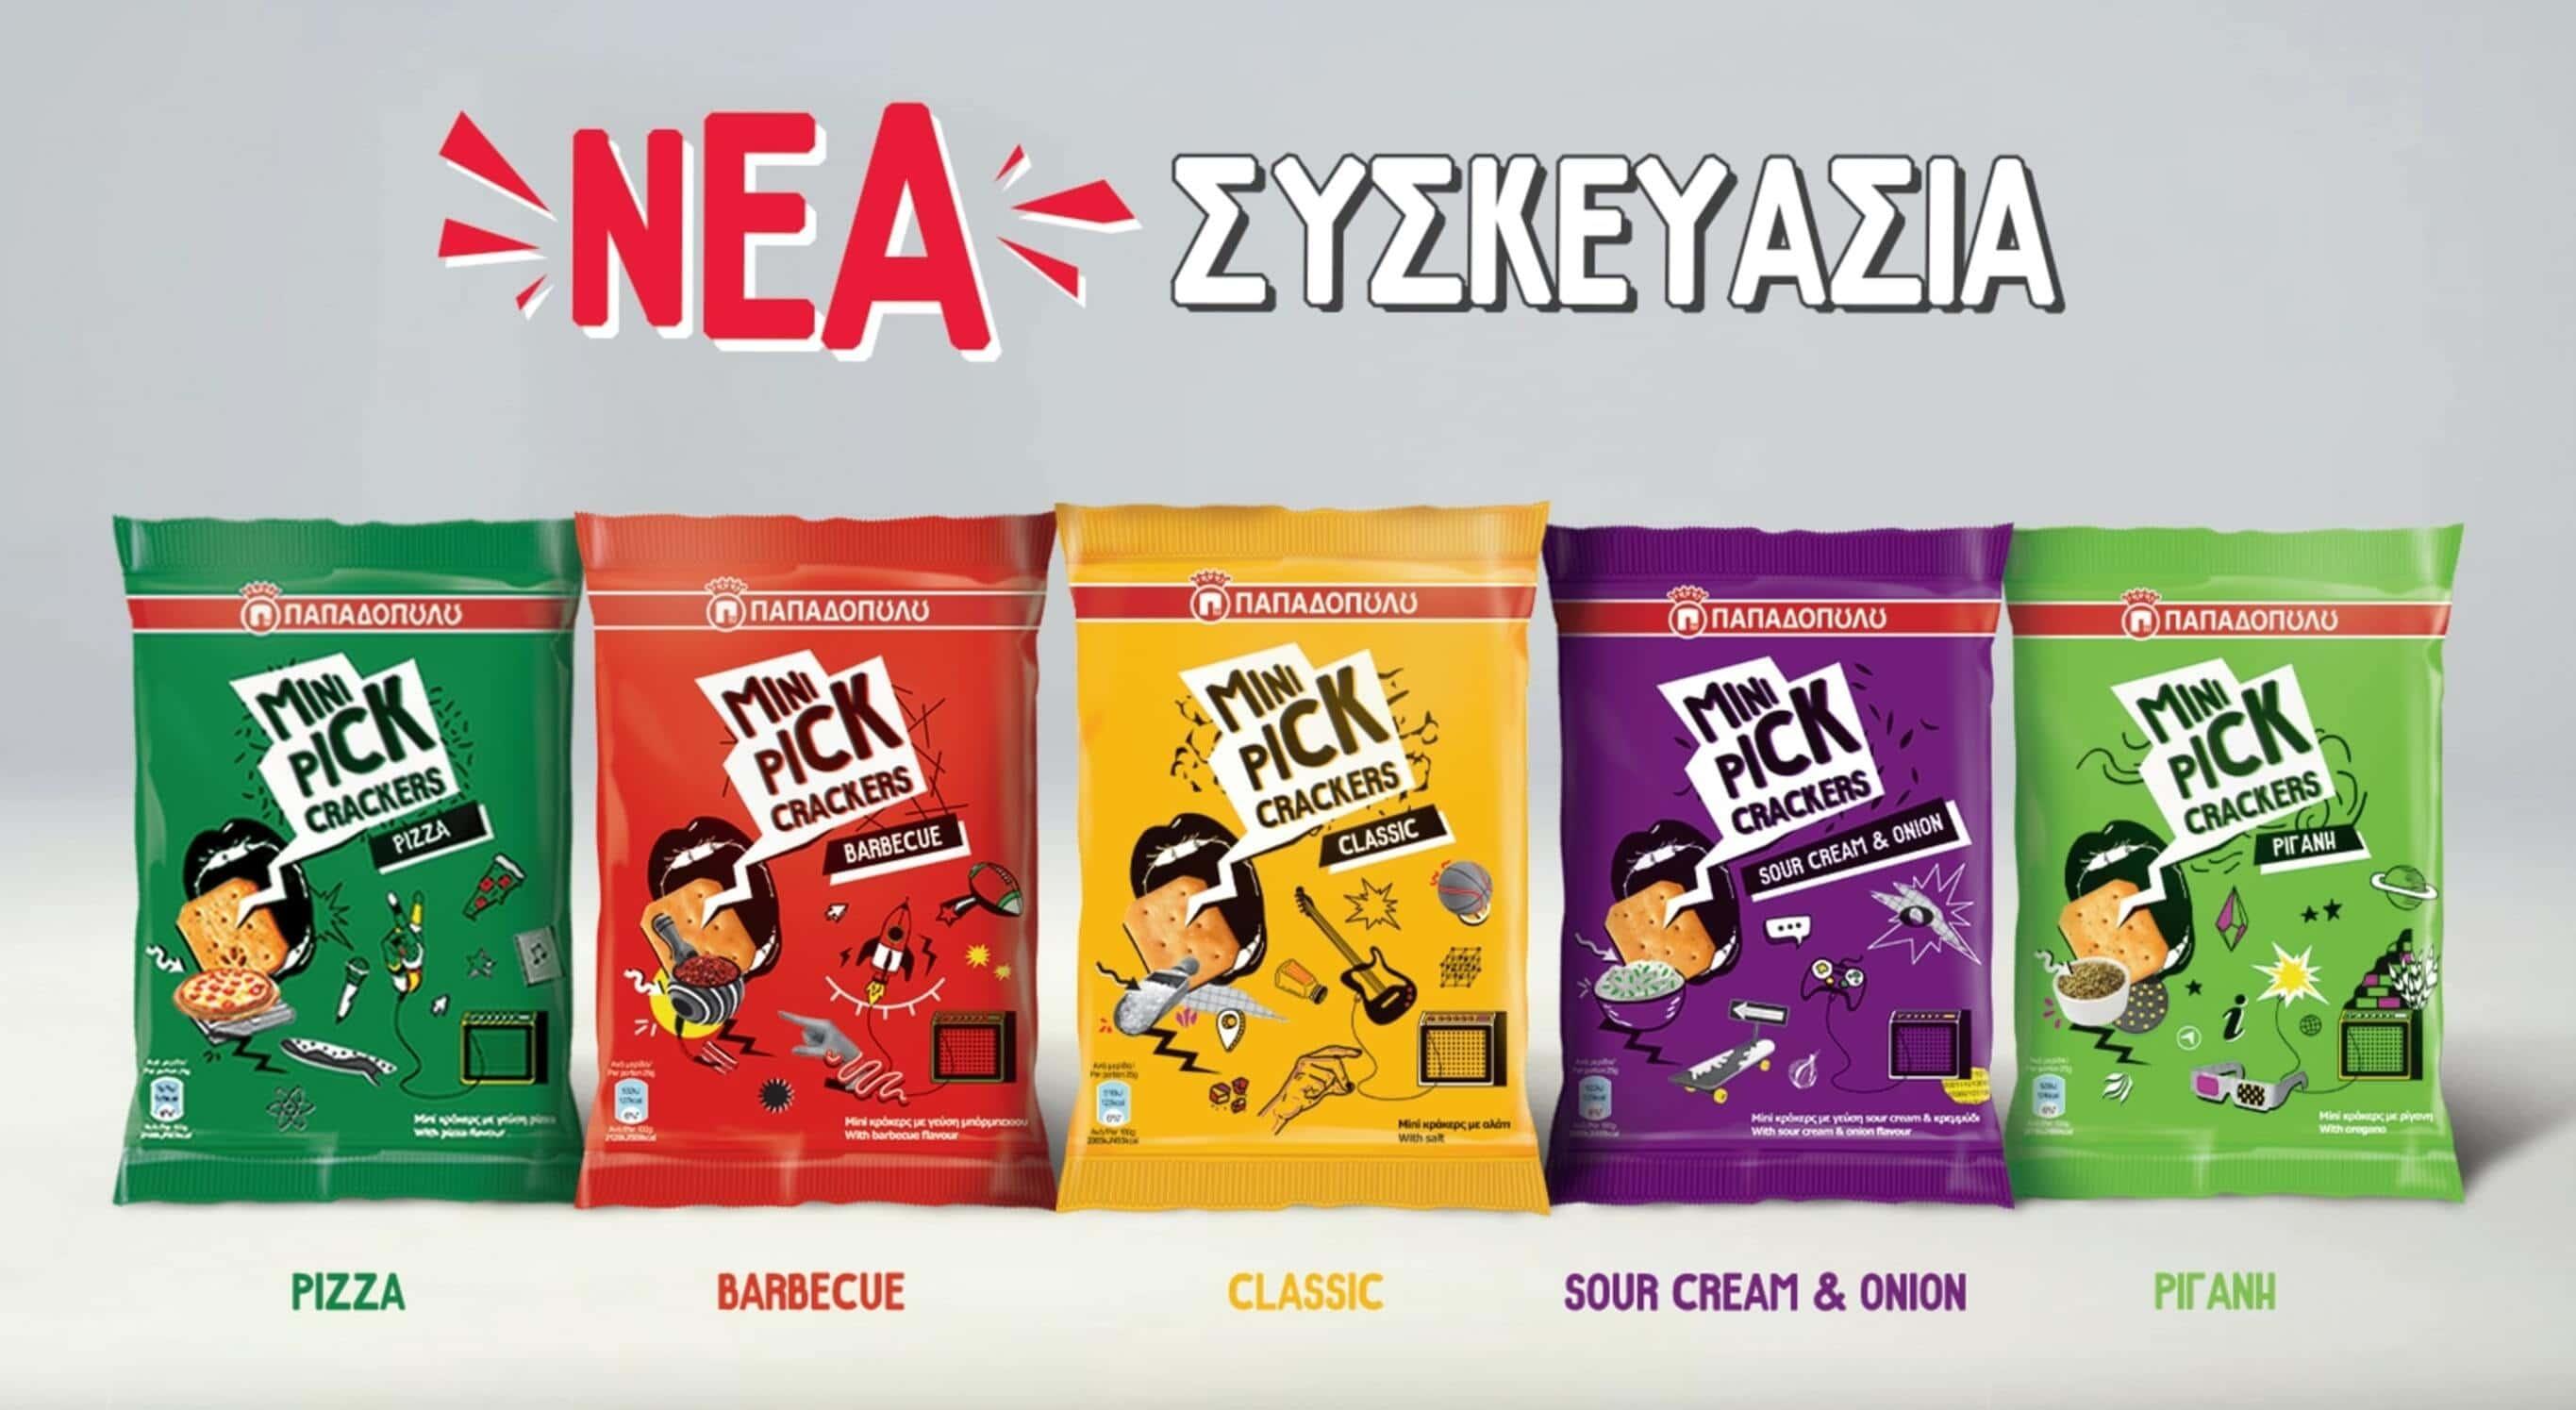 Featured image for Mini Pick Crackers Παπαδοπούλου τώρα σε ΝΕΕΣ συσκευασίες!